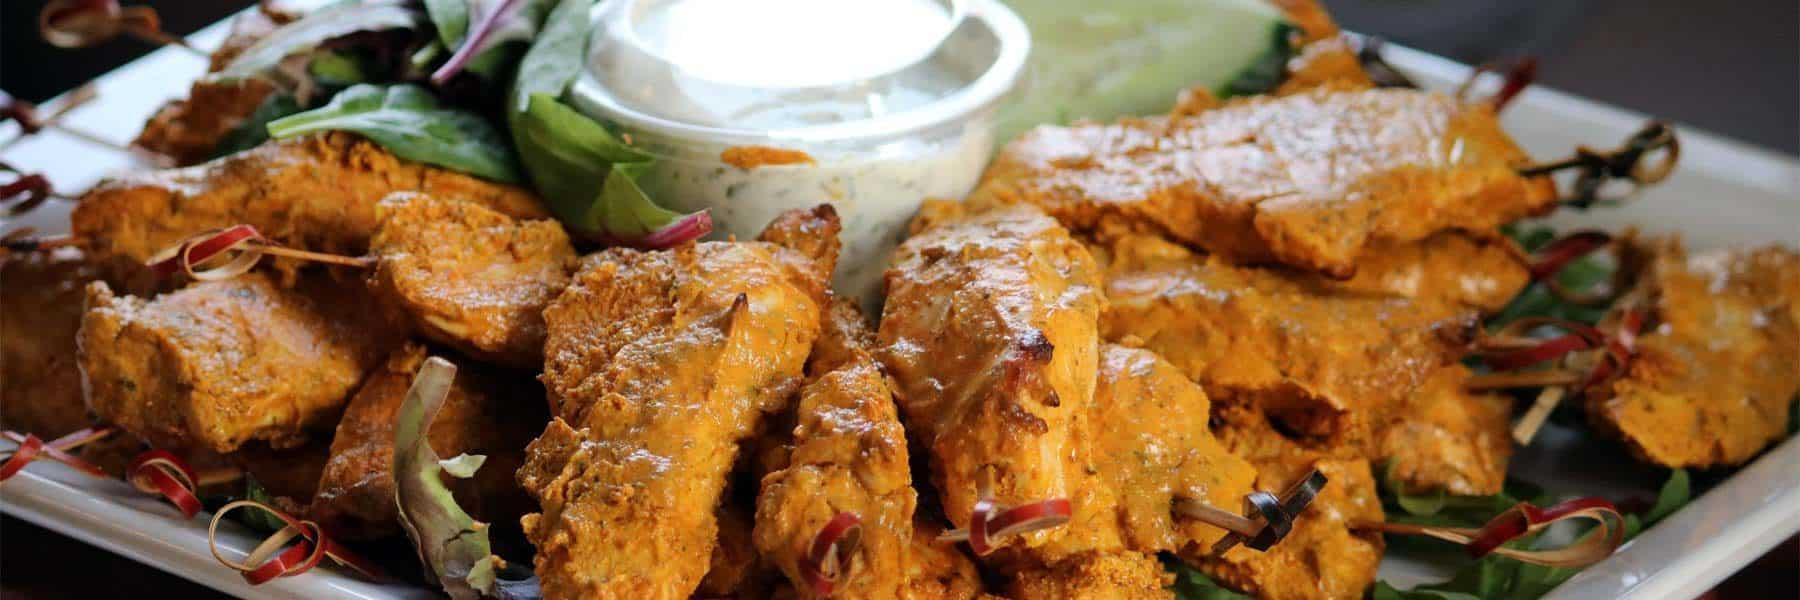 Chicken Tikka Skewers with Raita